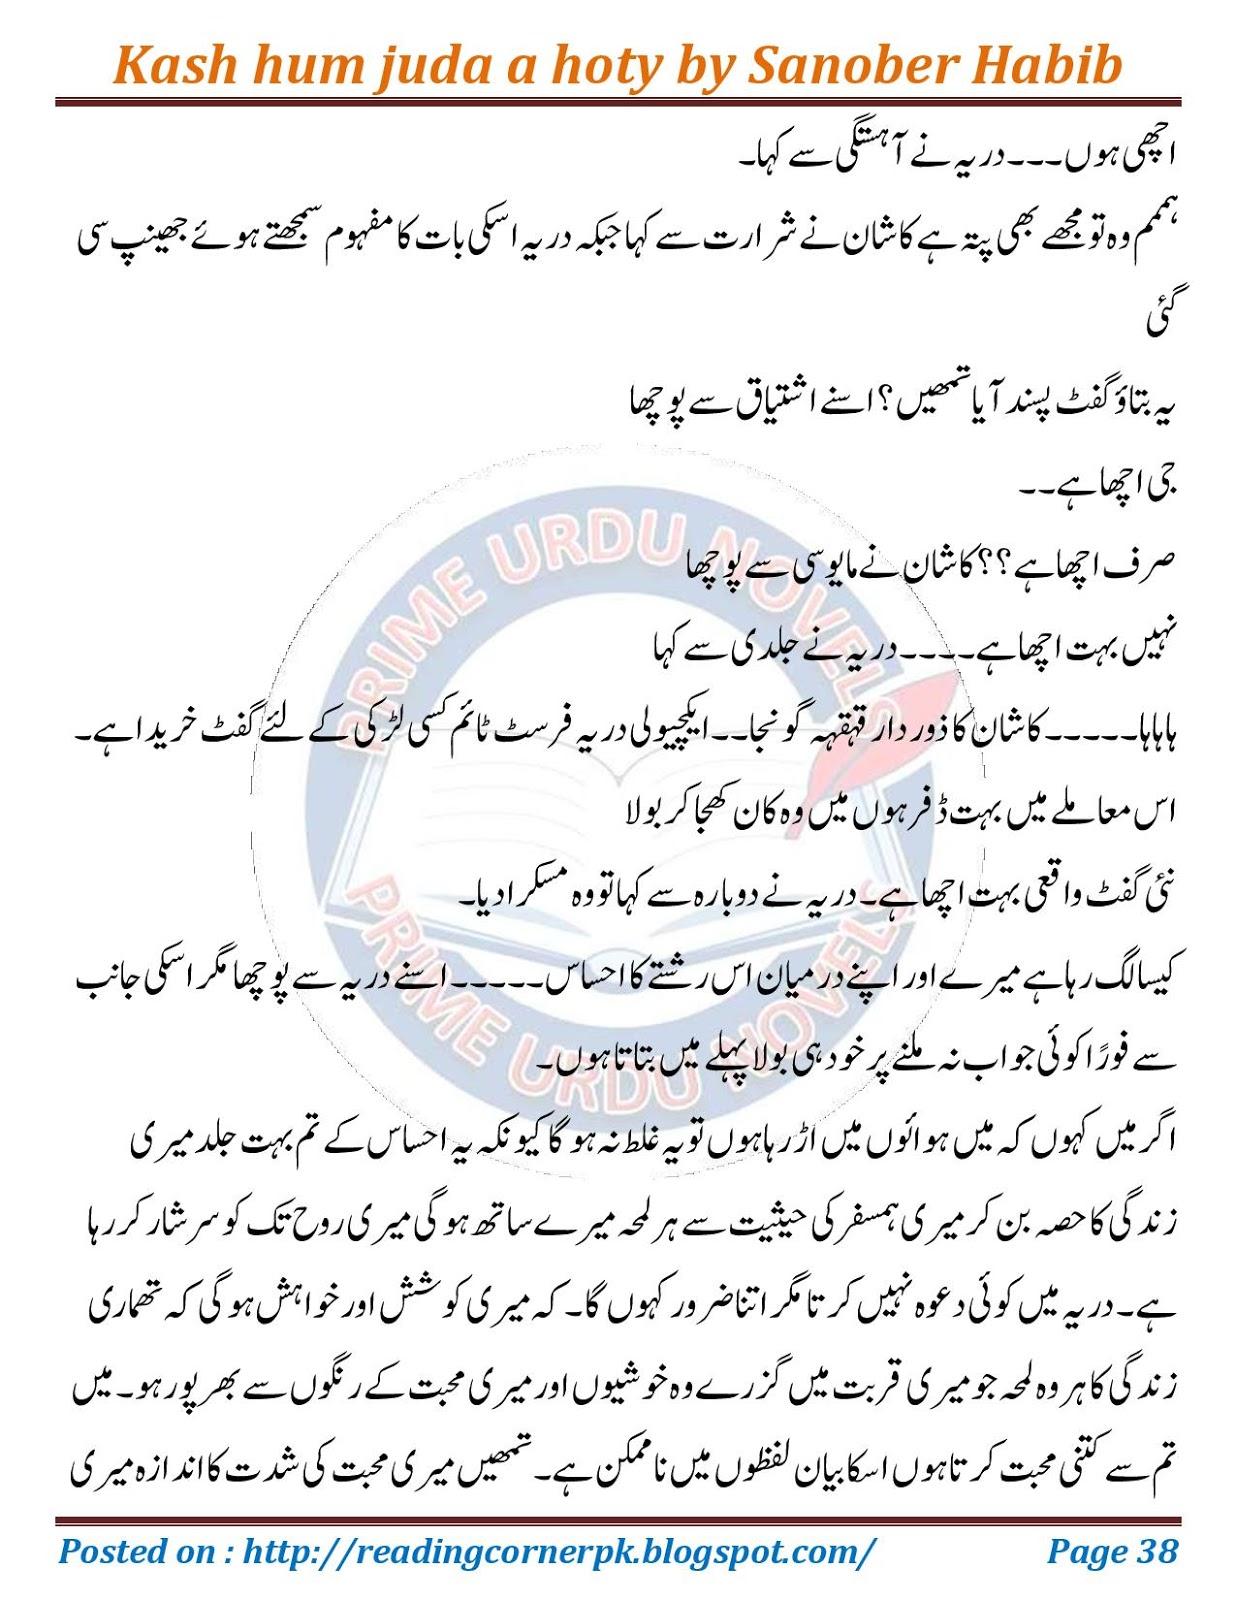 kash hum juda a hoty by sanober habib complete pdf read online